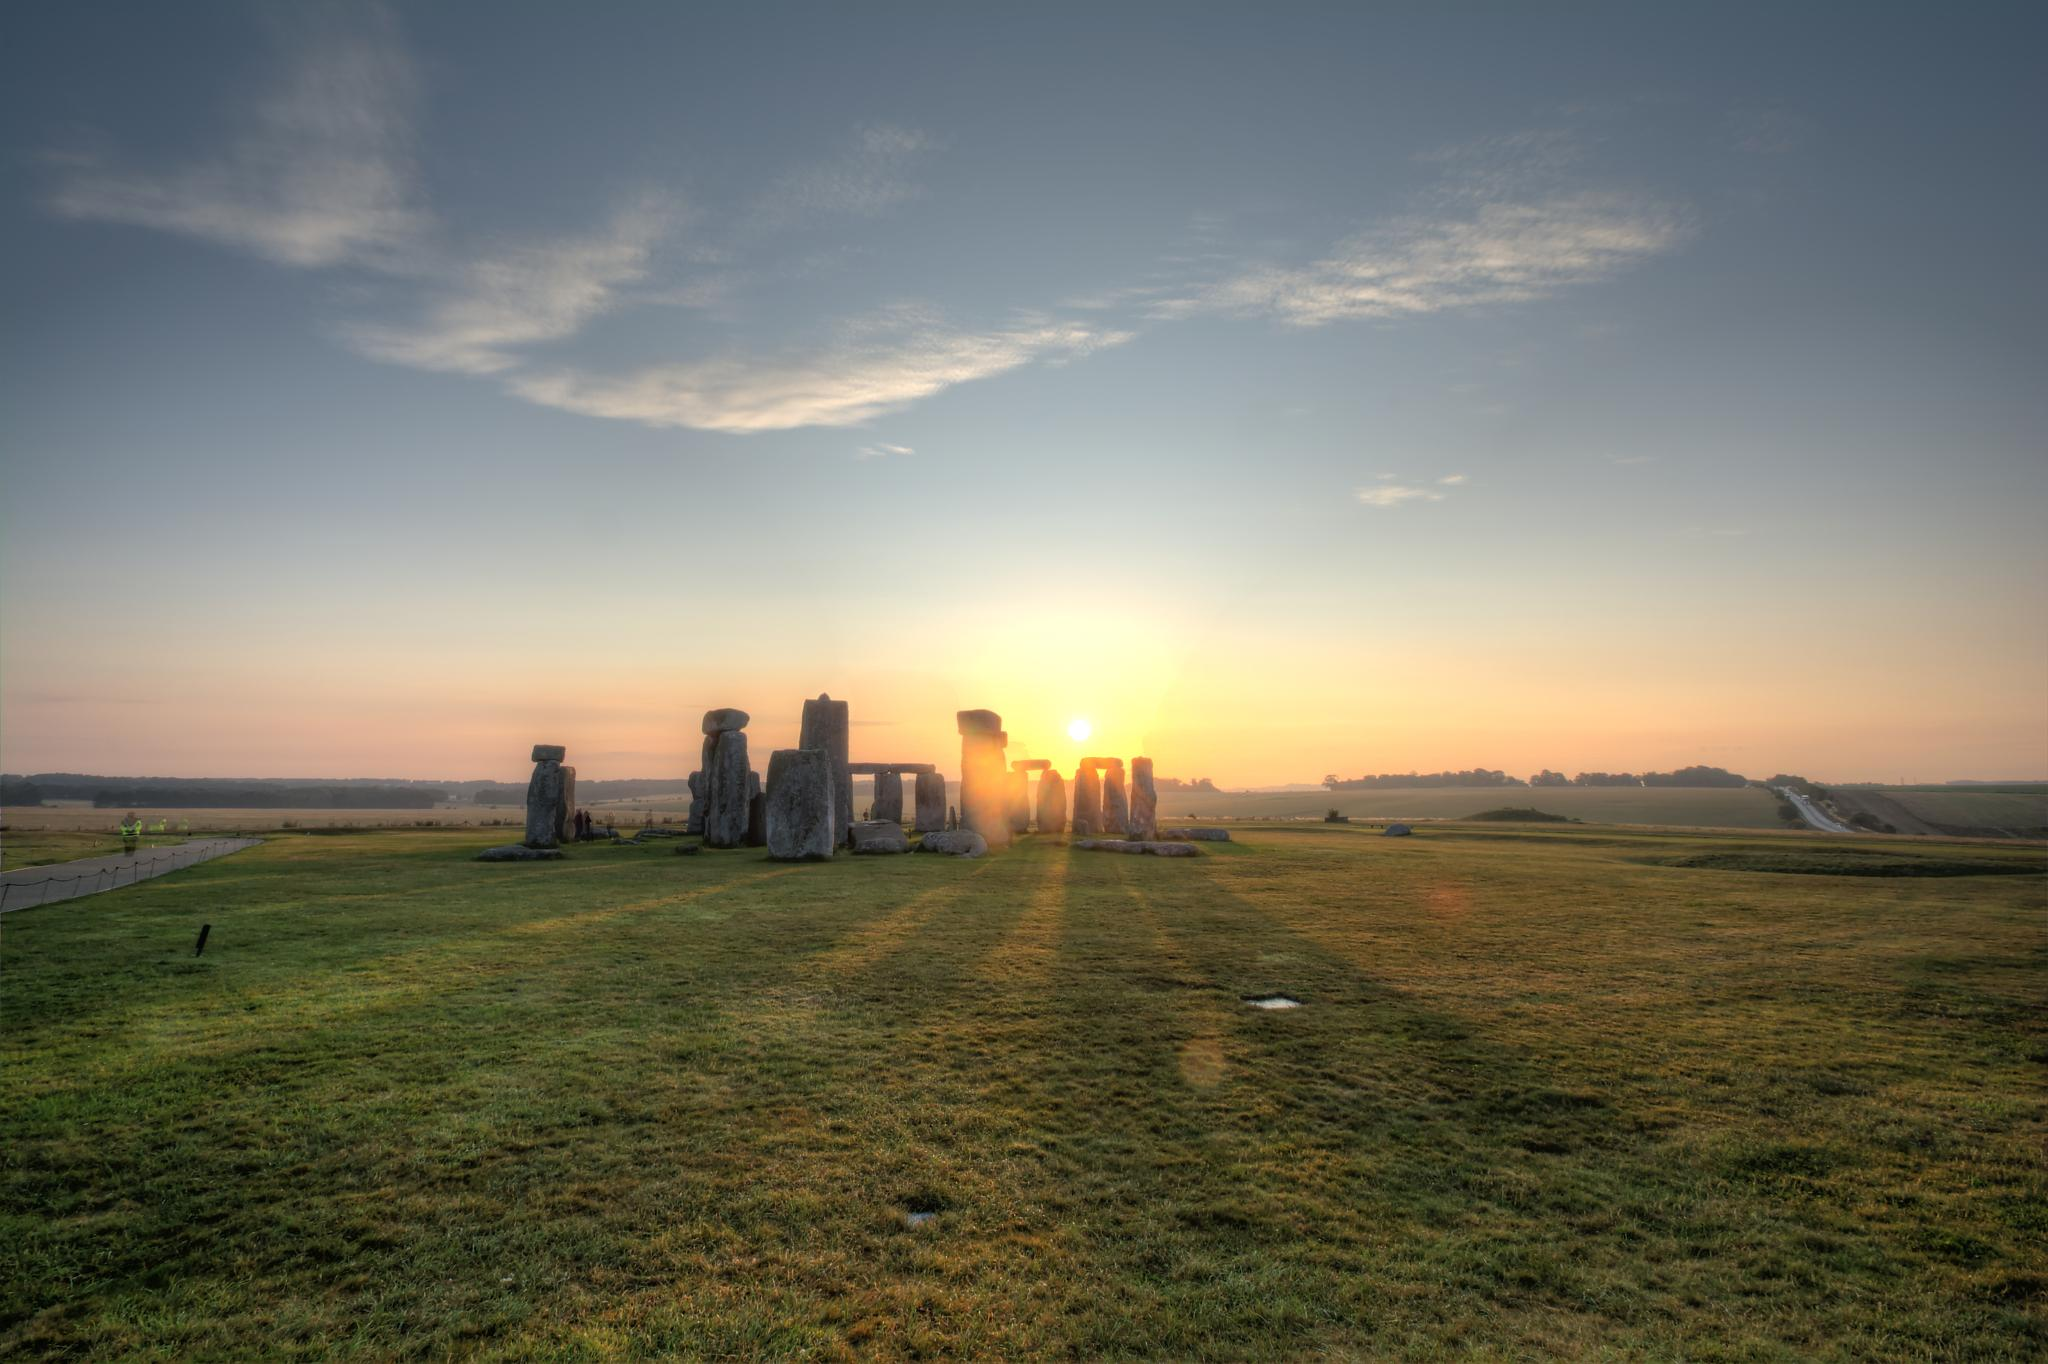 Stonehenge Dawn by John McNeilly